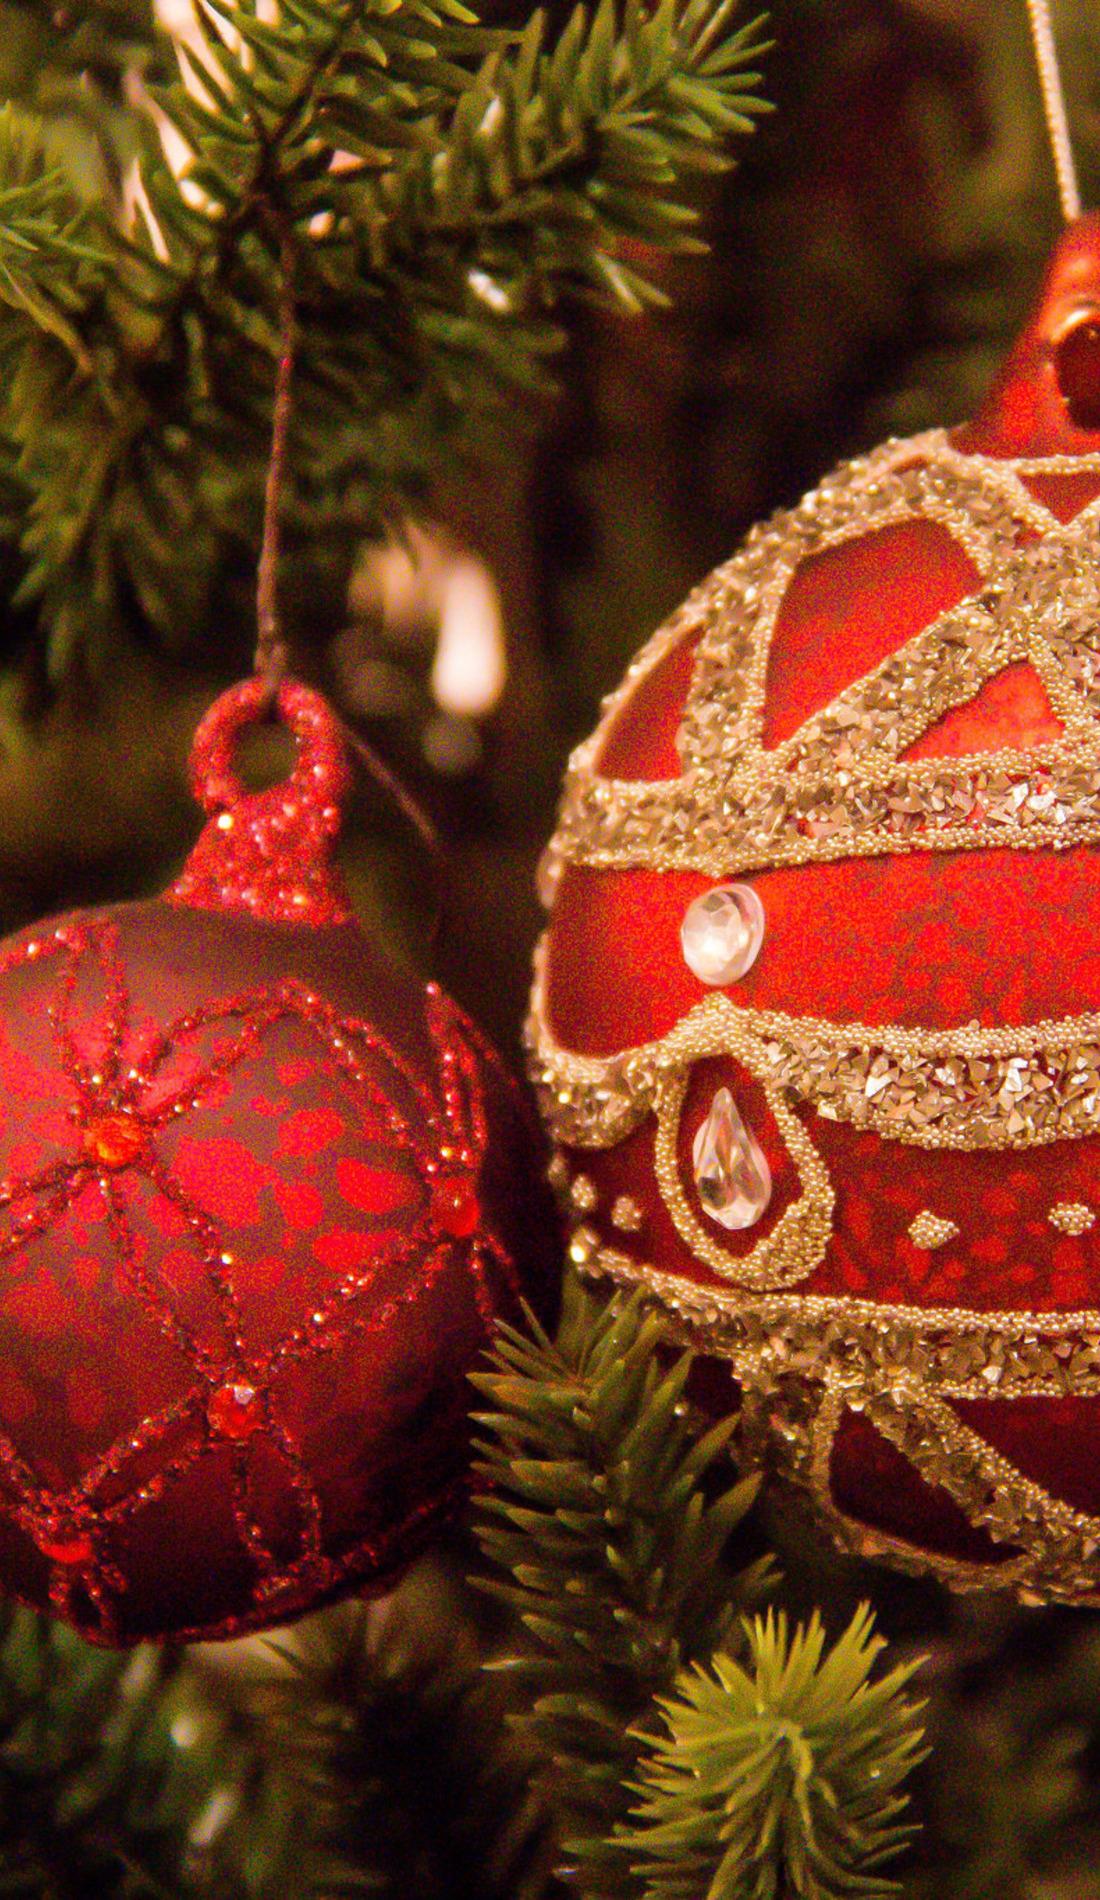 A A Christmas Story live event